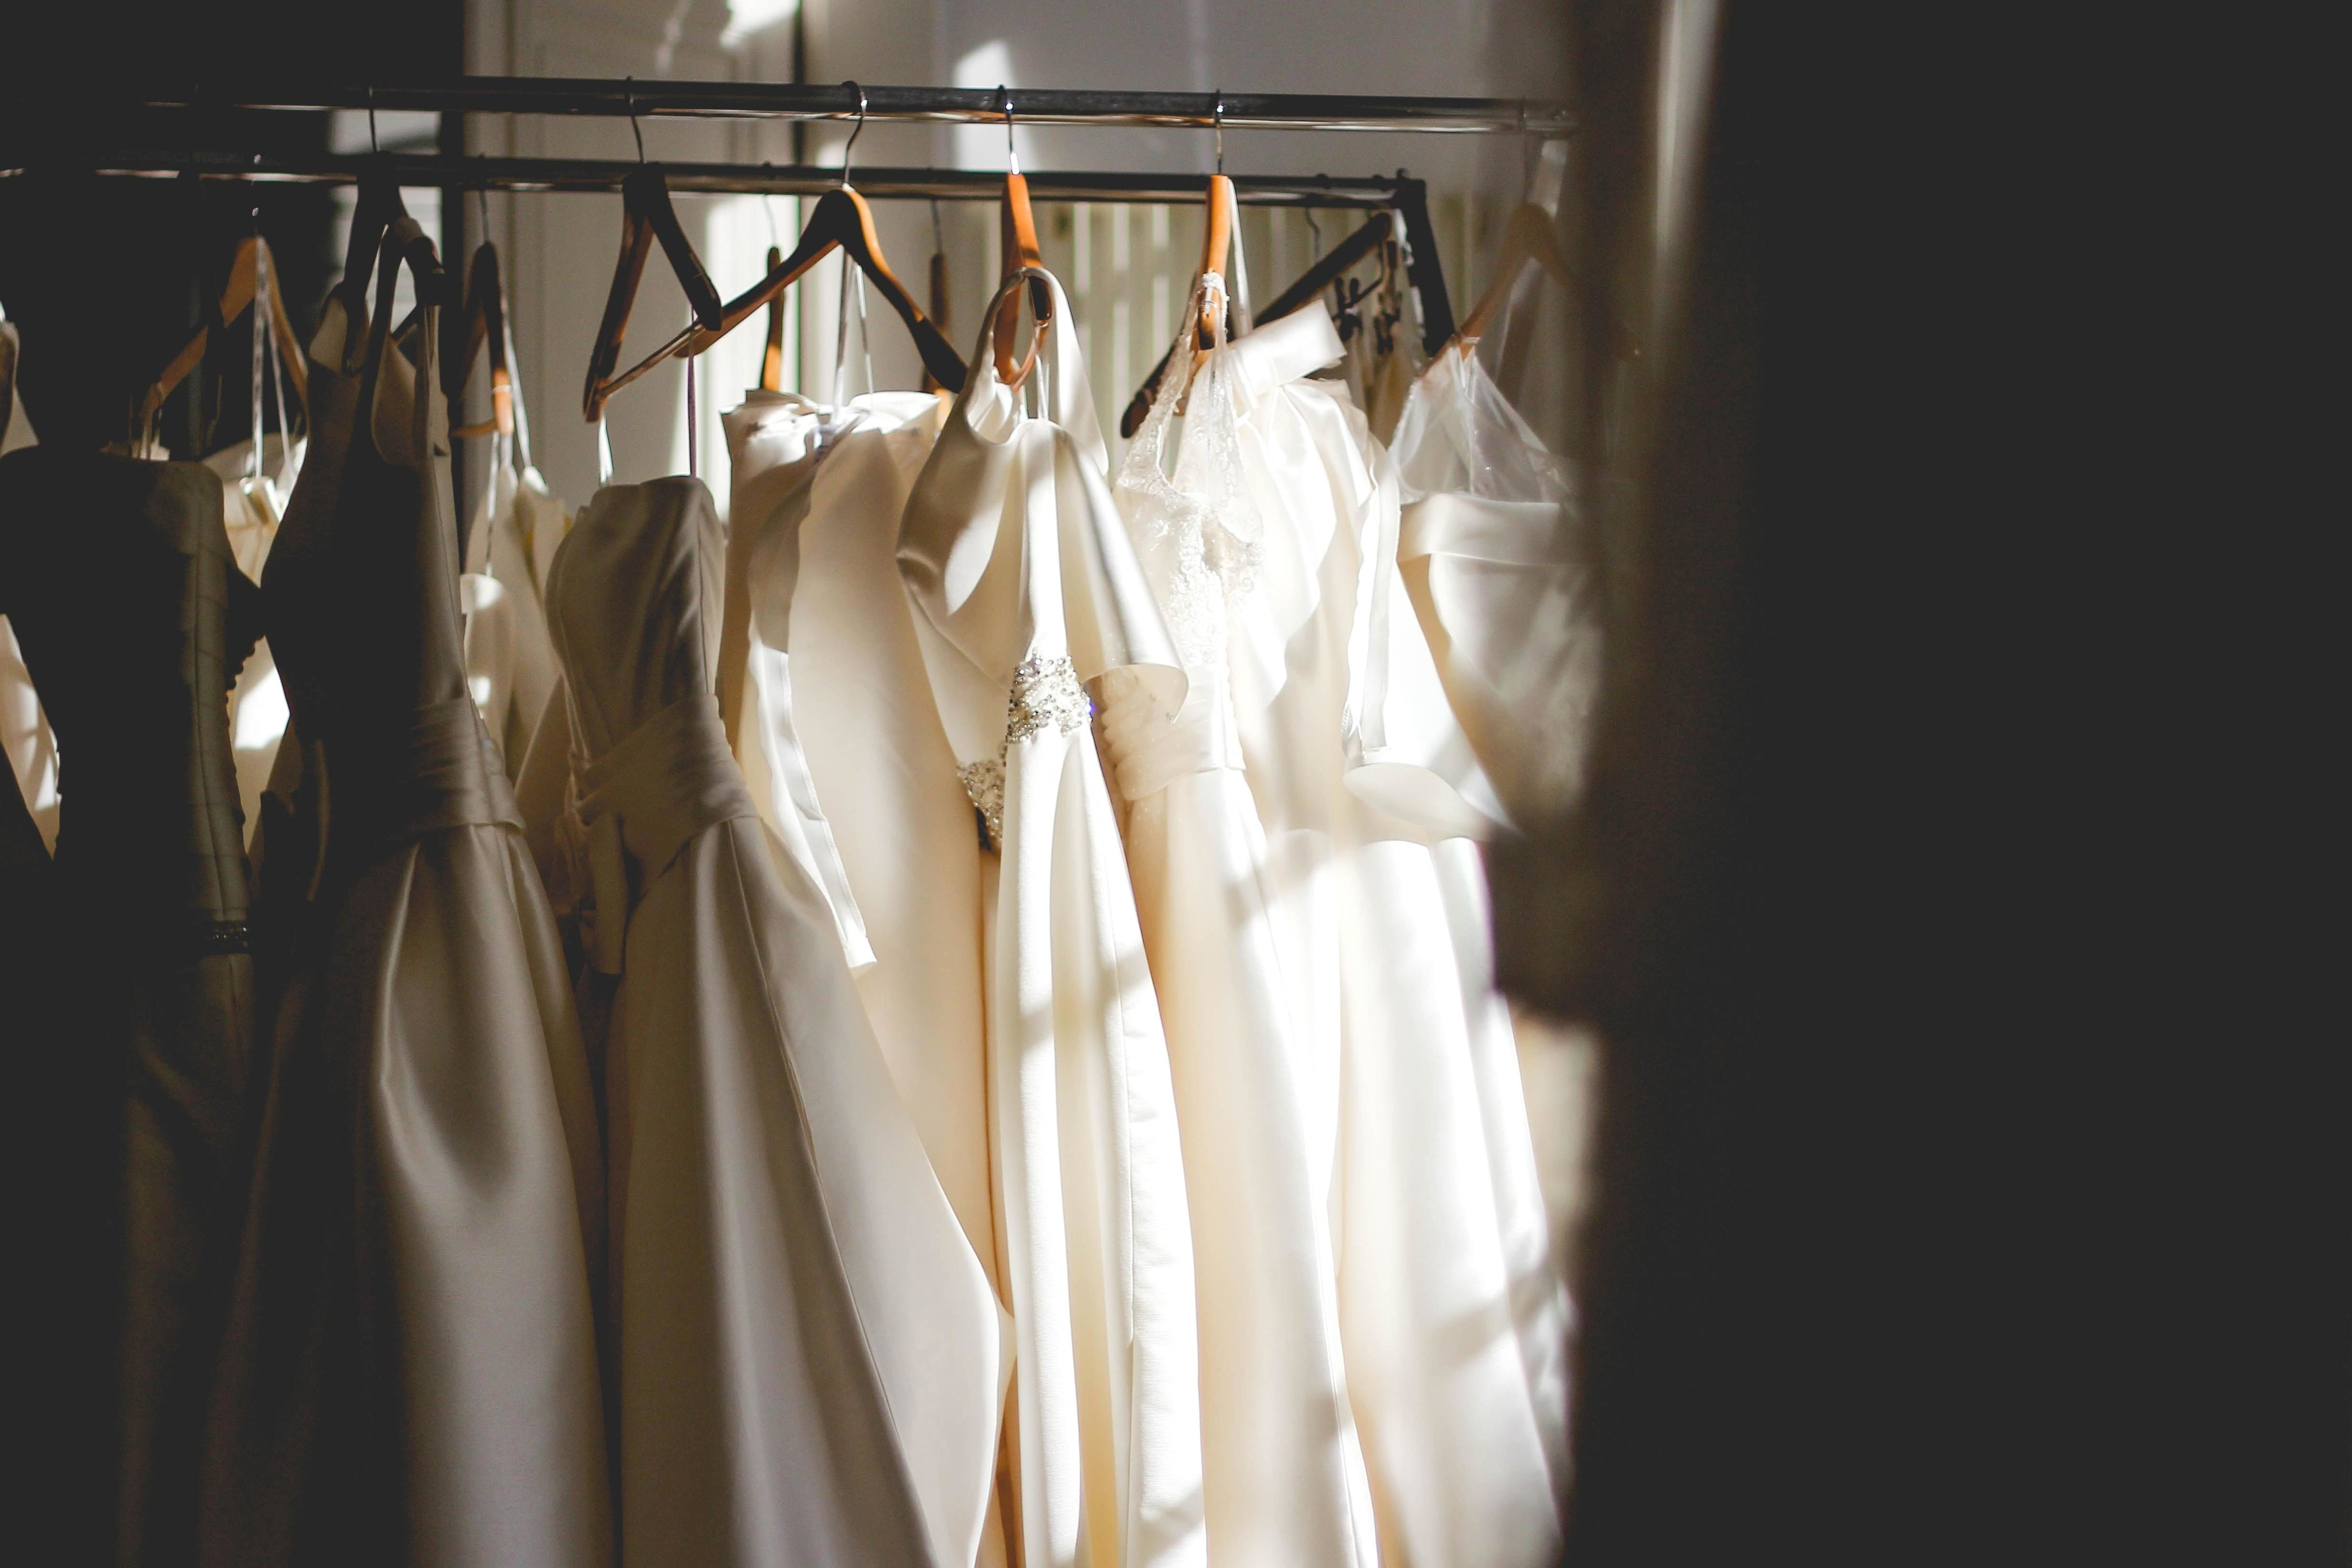 Boutique de vestidos de novia